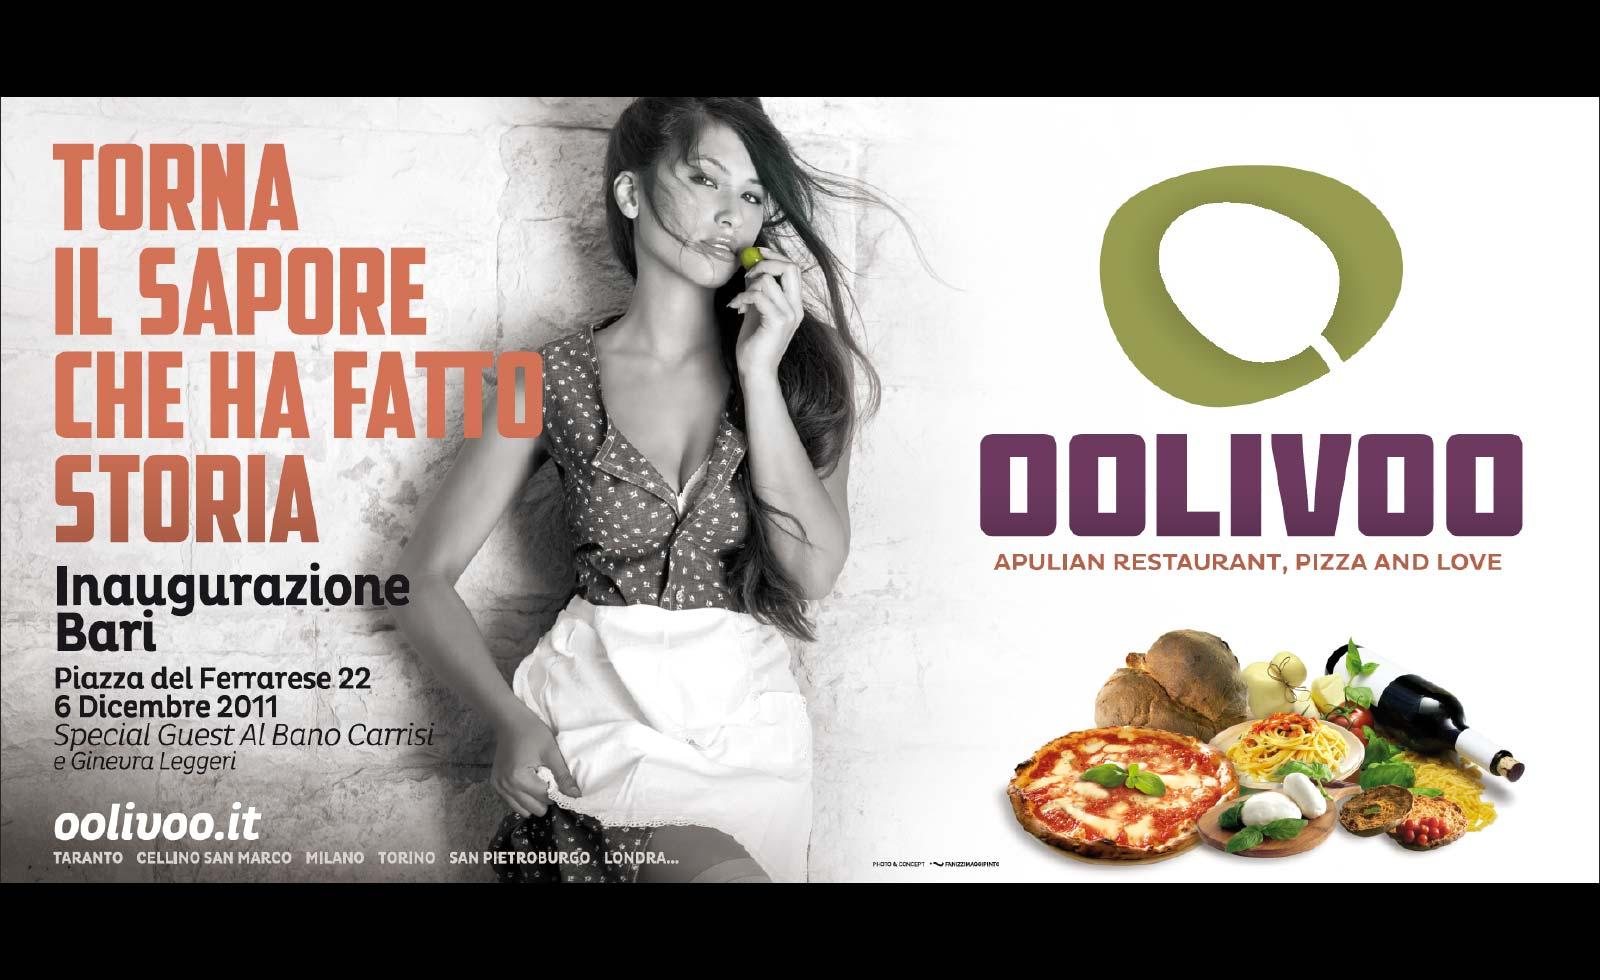 oolivoo pizza restaurant advertising adv campaign pubblicita ristorante